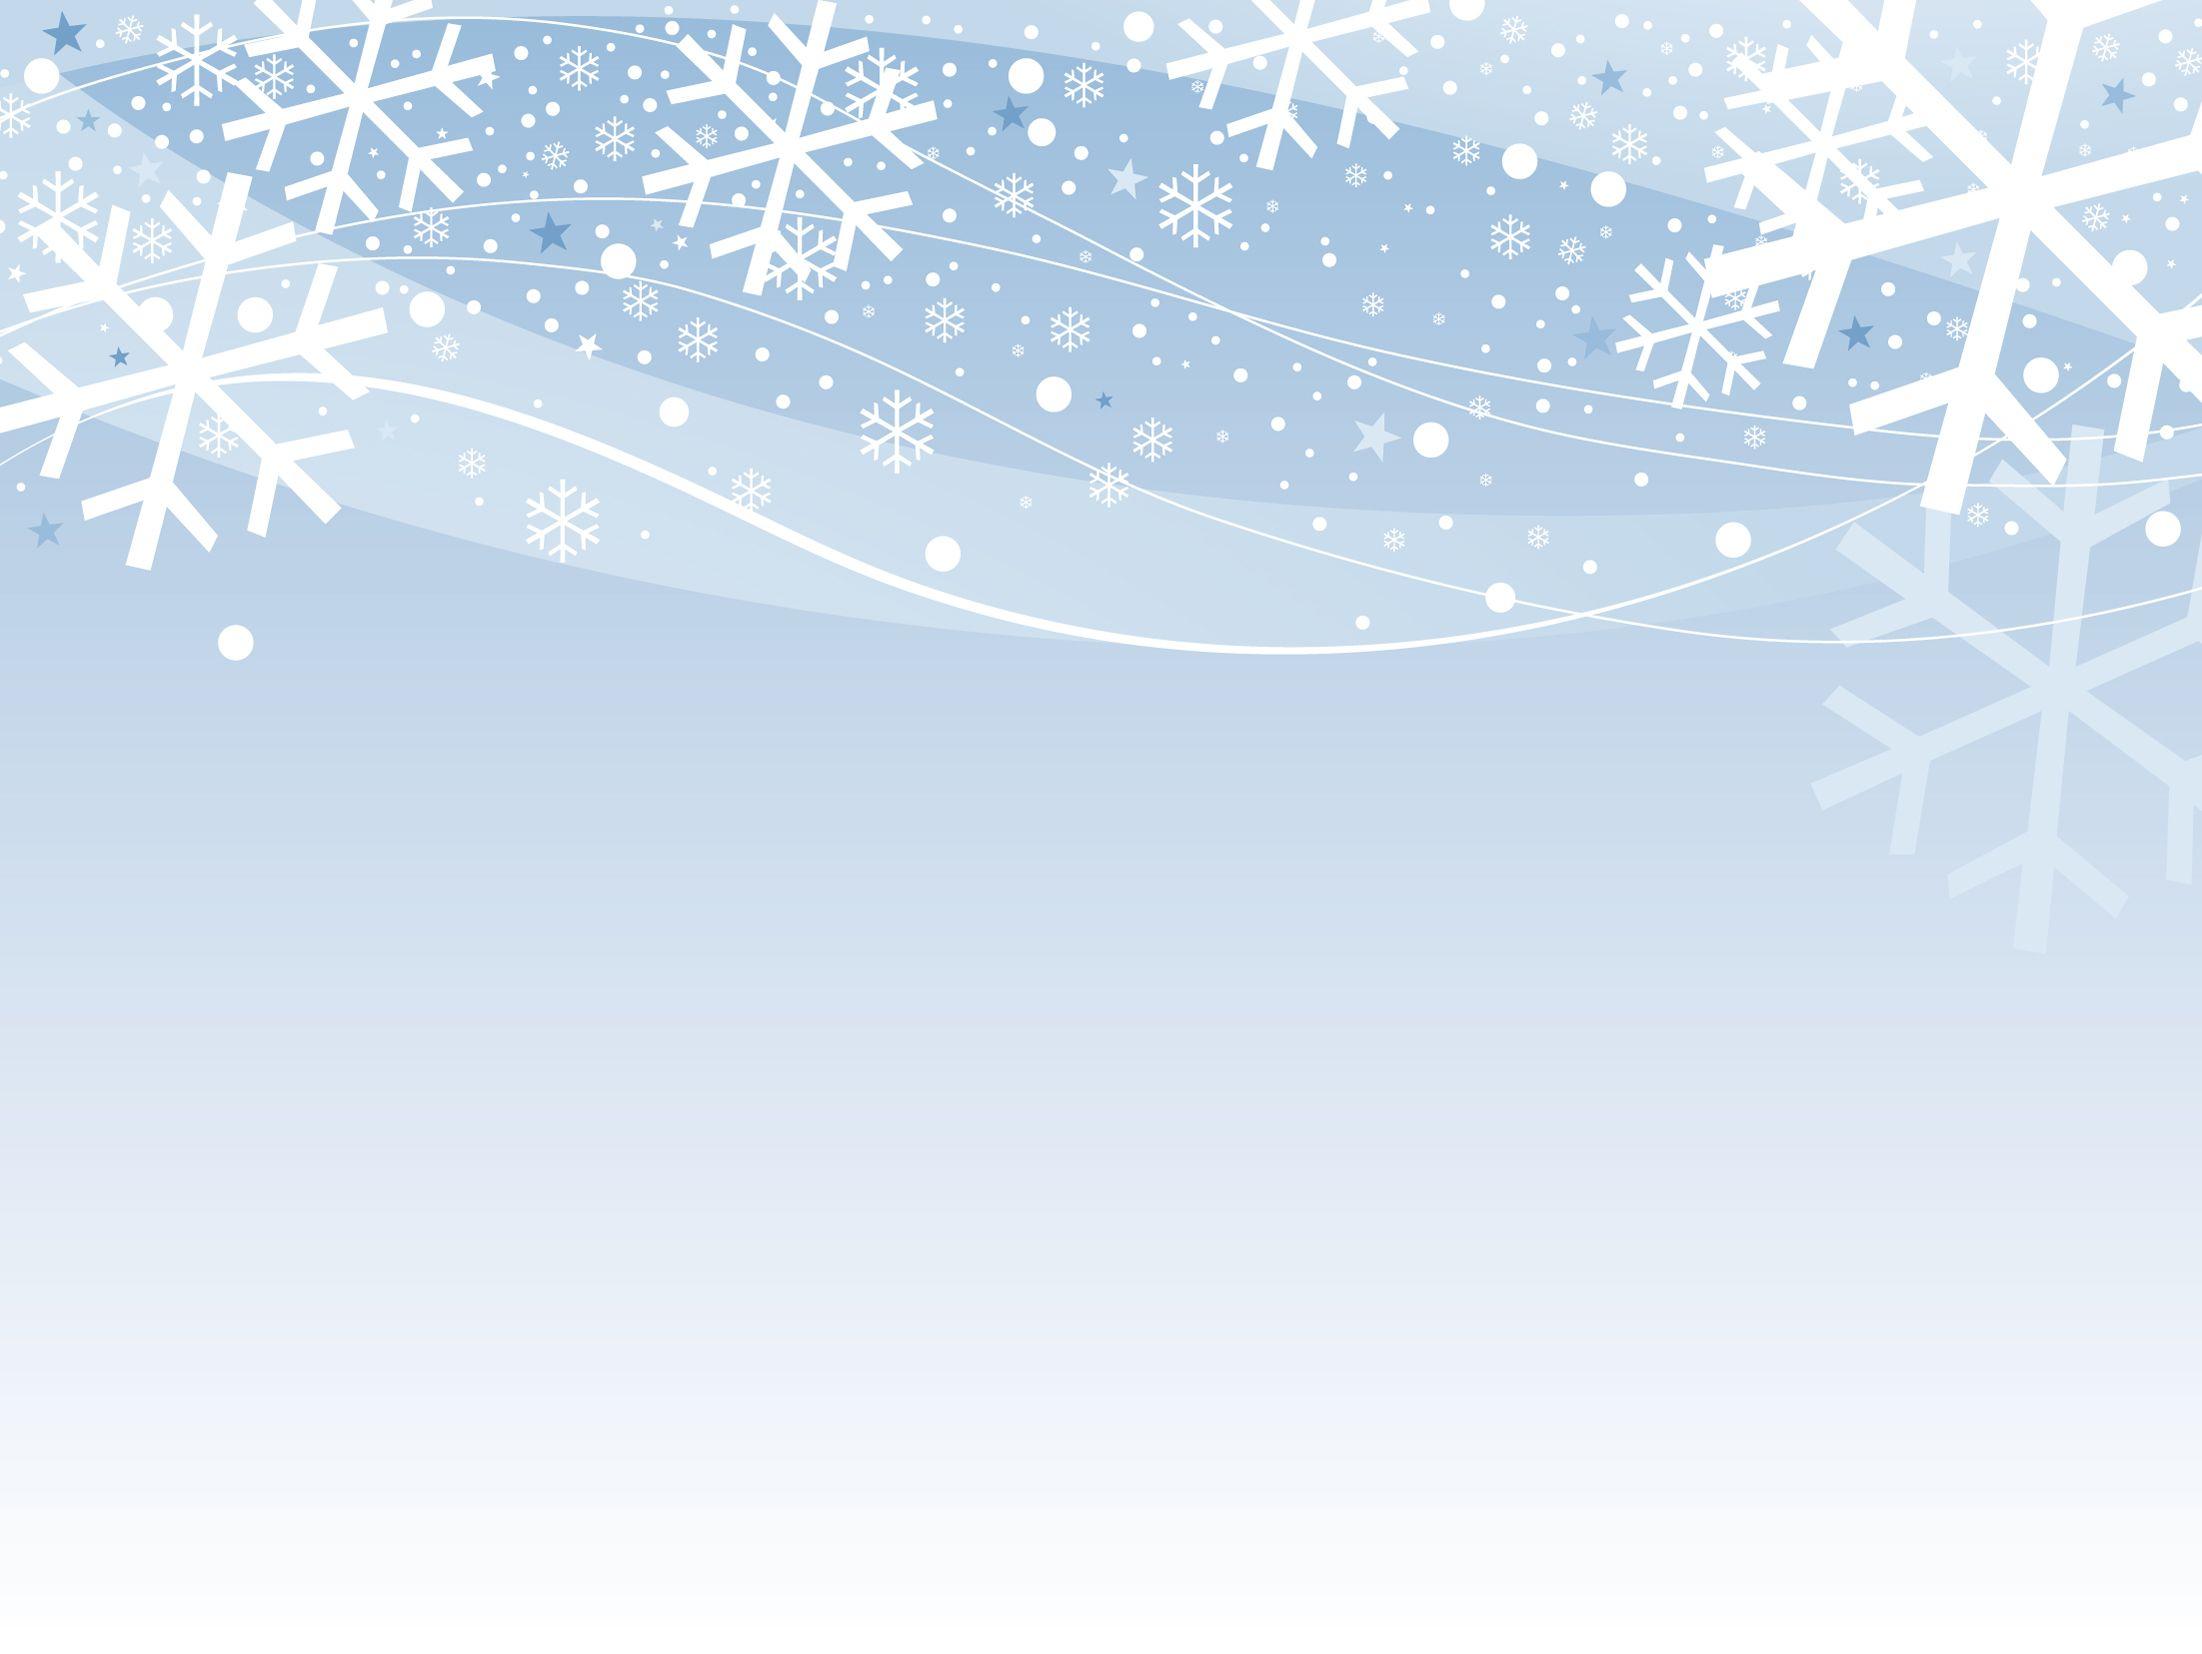 Fondos De Pantalla Hd Navidad 2016: Fondos De Navidad Para Power Point Para Pantalla Hd 2 HD